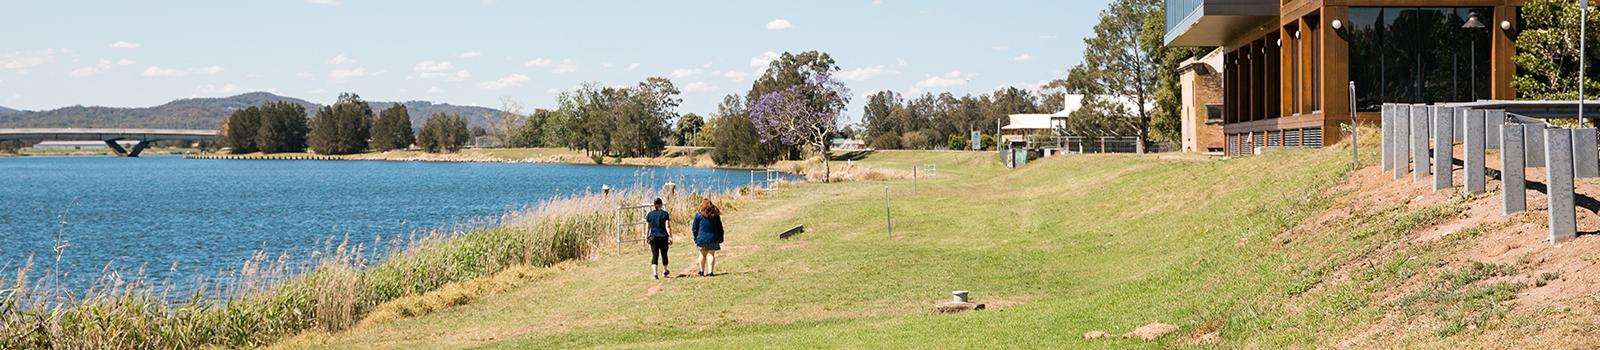 Image of walking along the river bank